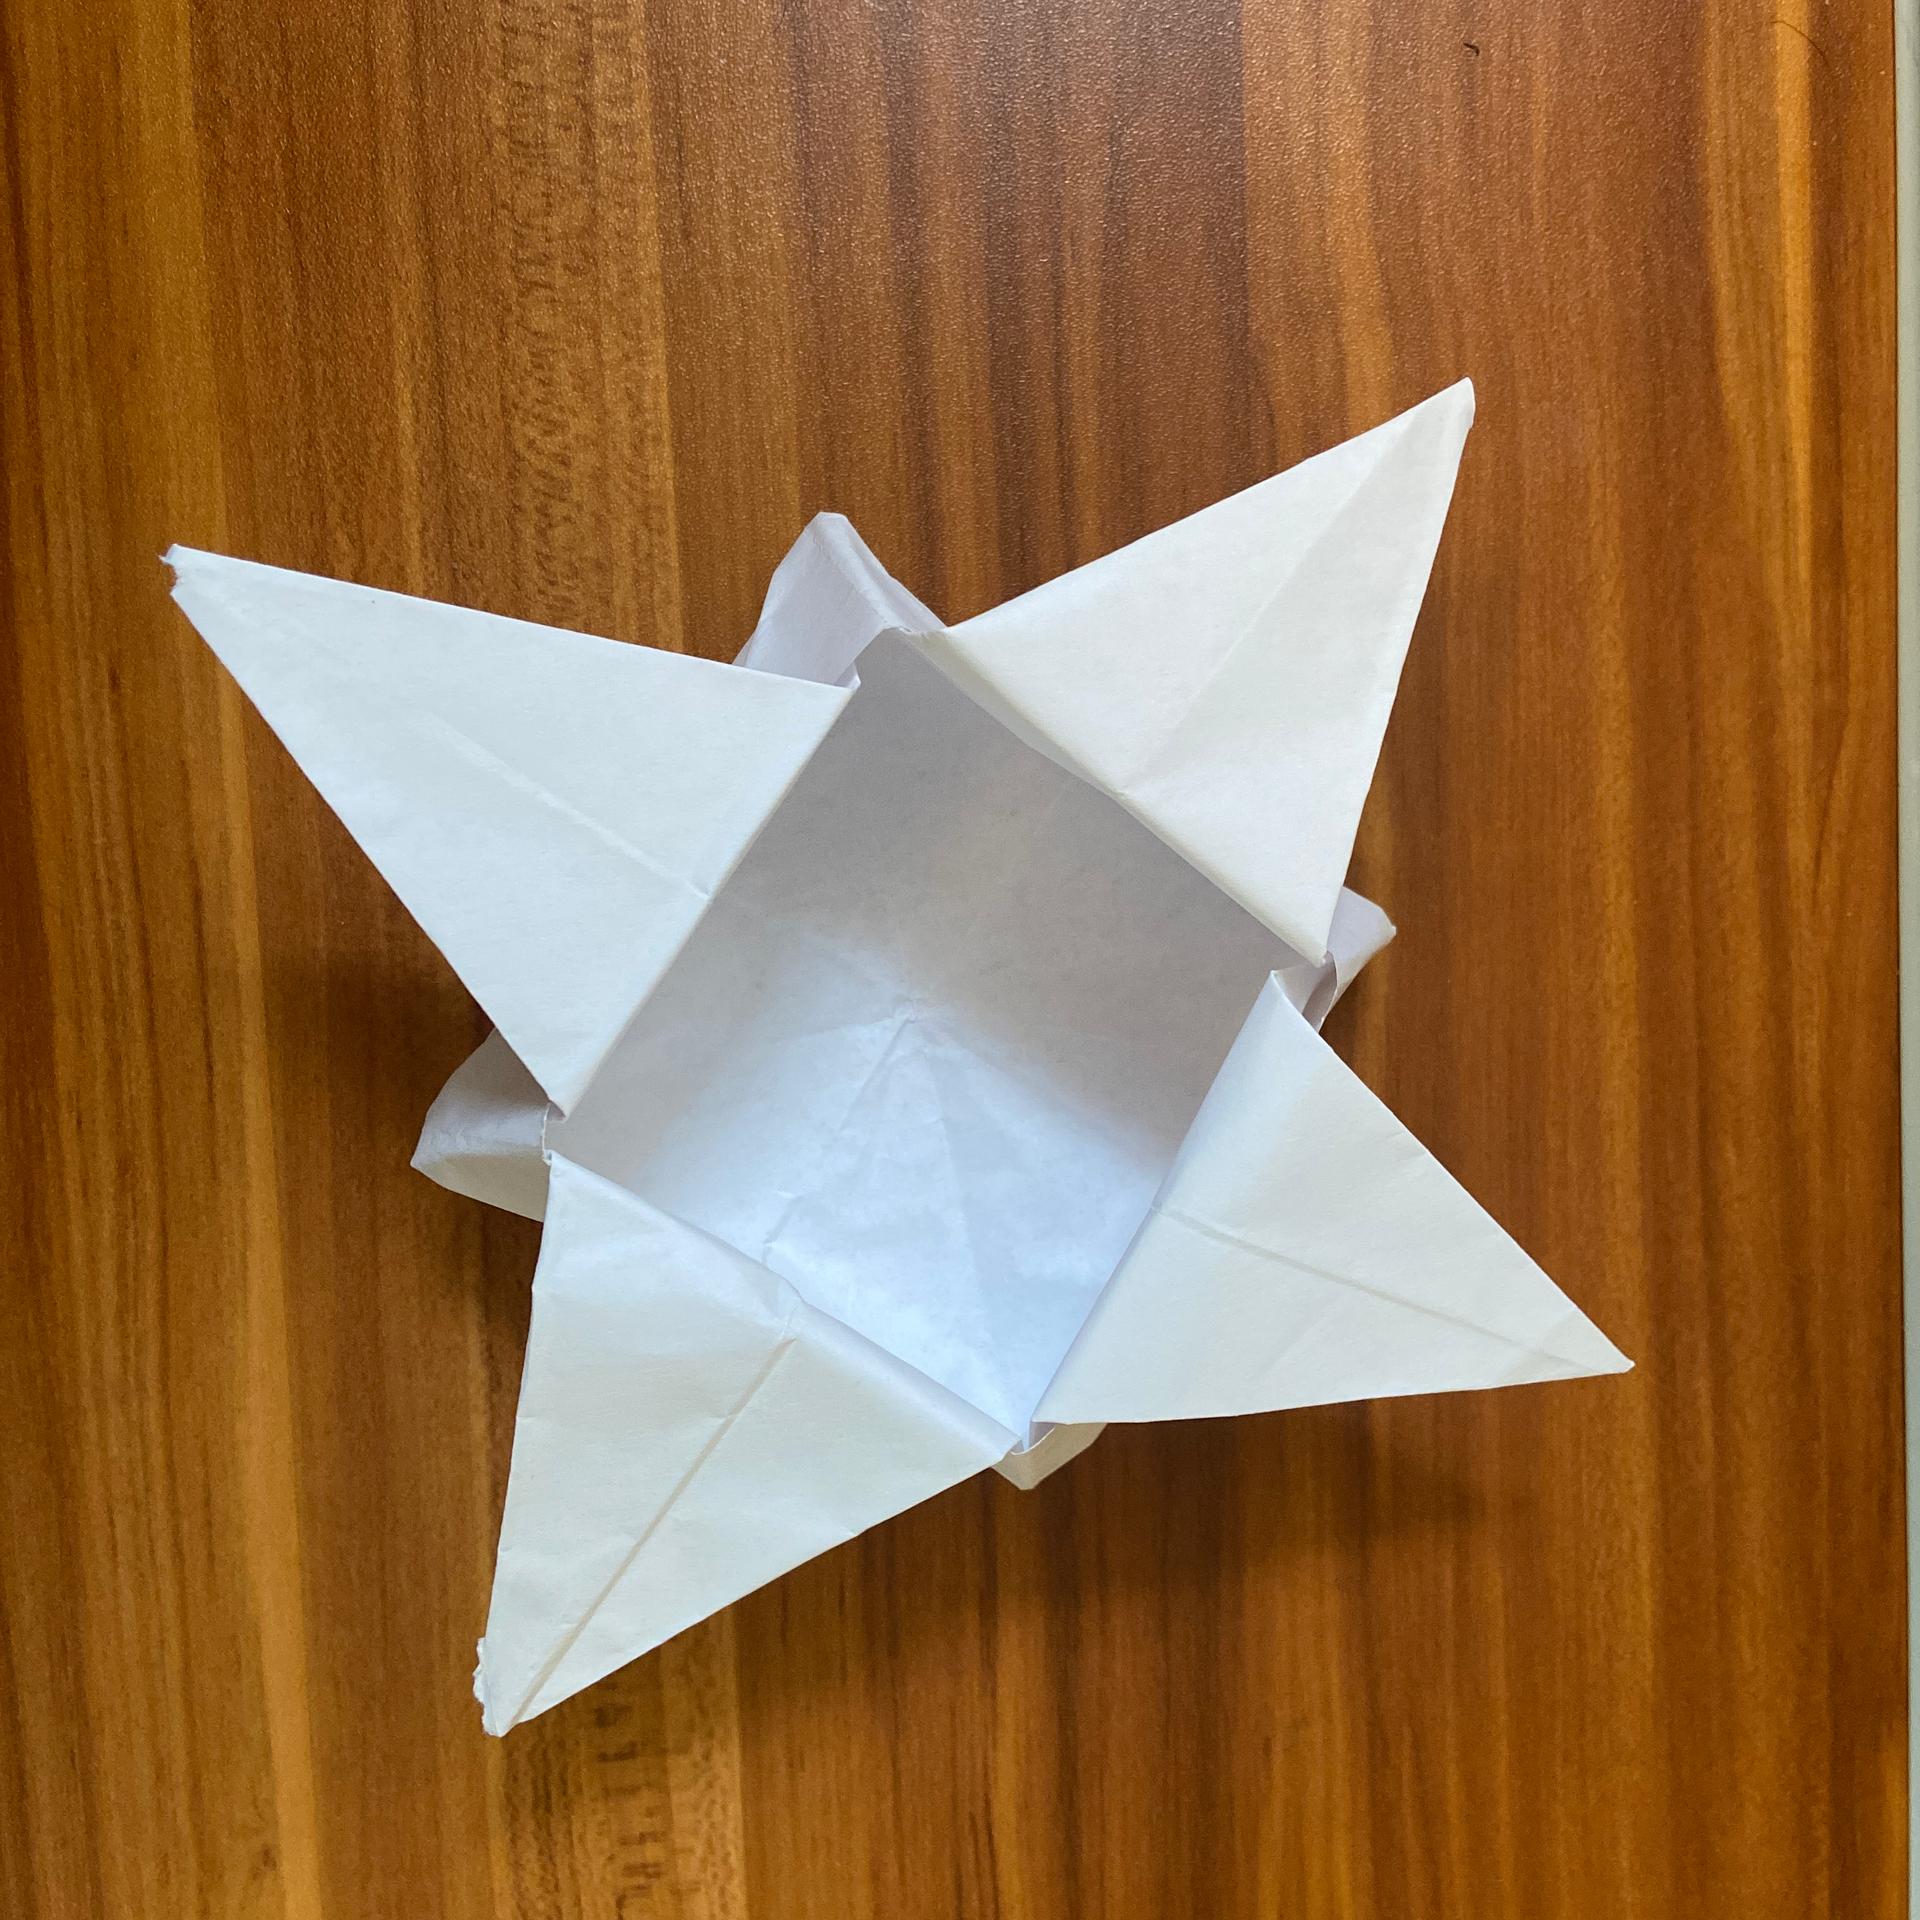 Origami Bowls (Apr 30, 2020 at 6:12 PM).